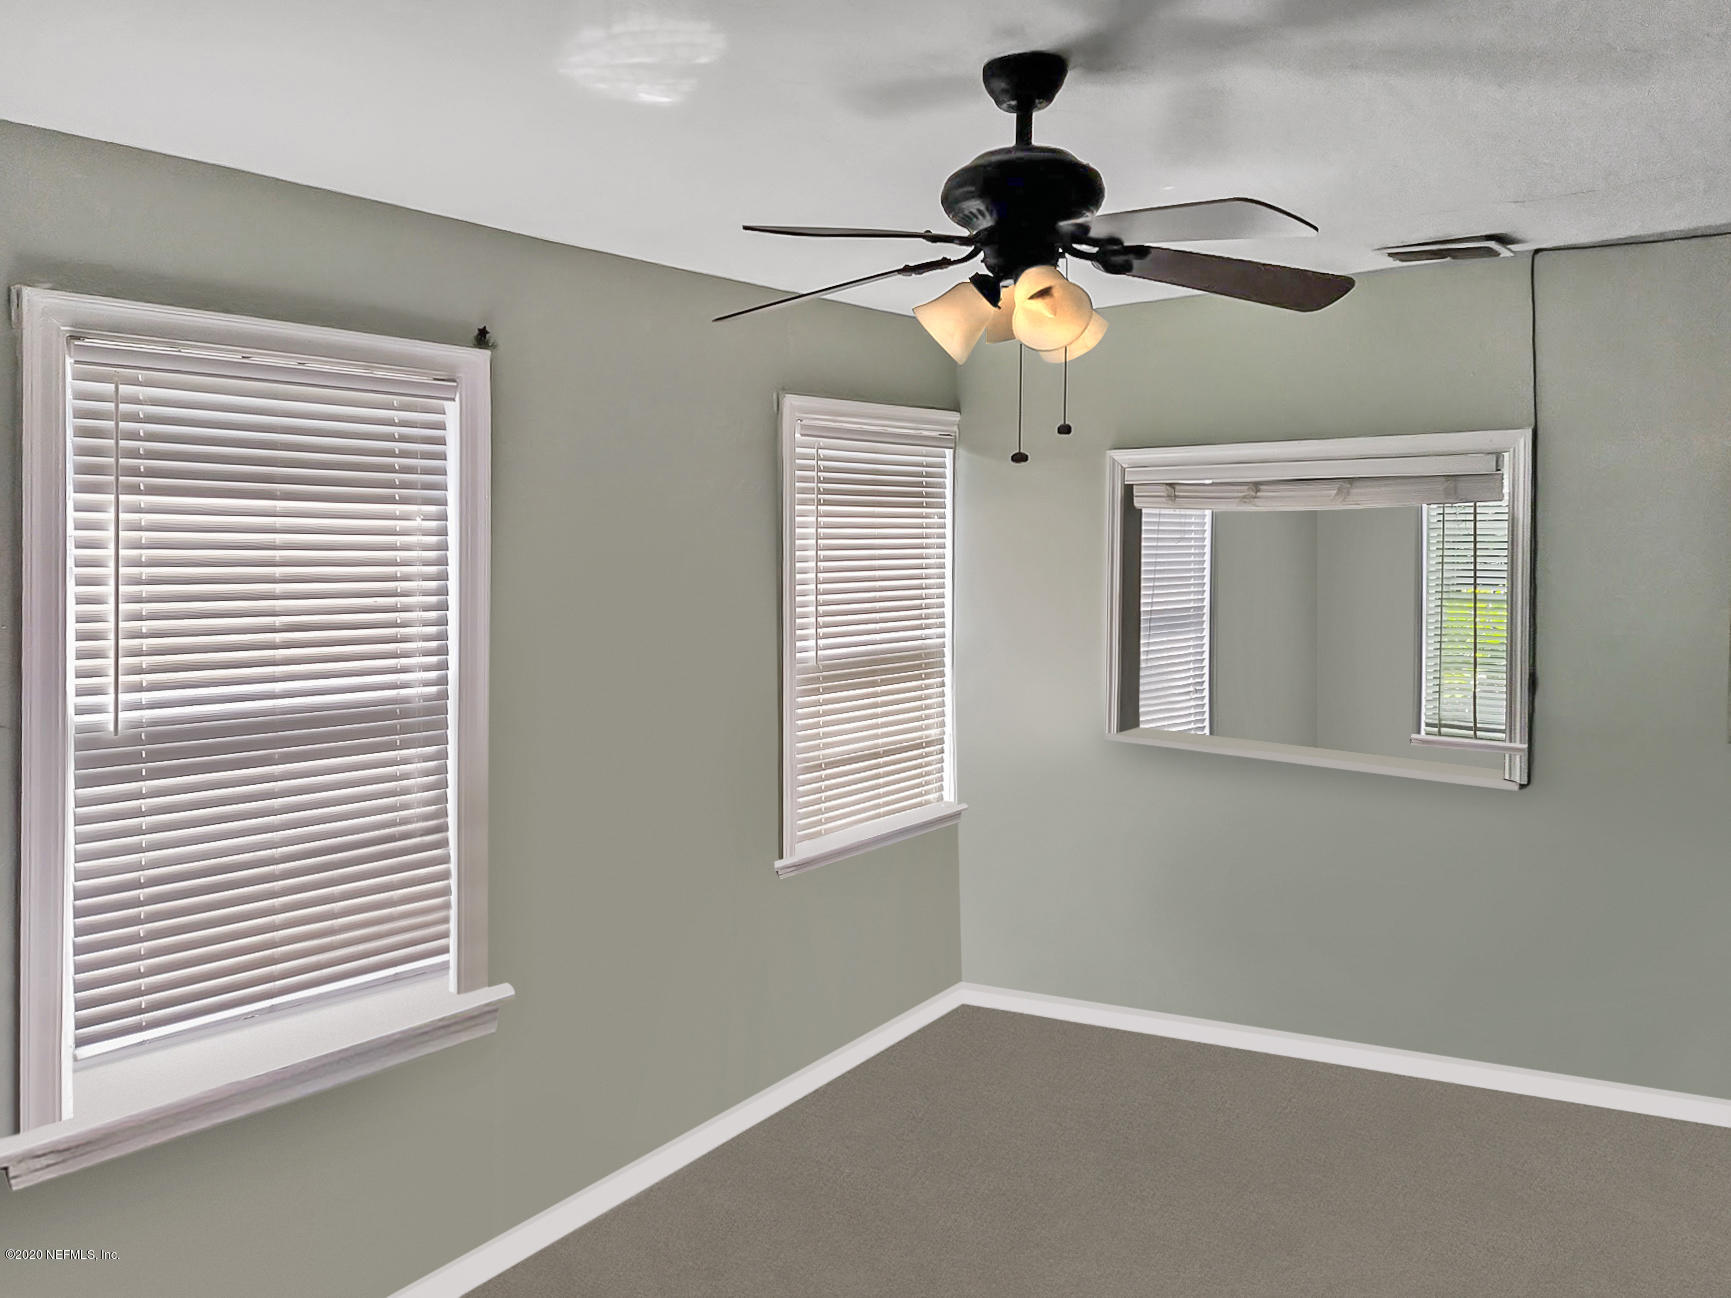 5220 SAN JUAN, JACKSONVILLE, FLORIDA 32210, 3 Bedrooms Bedrooms, ,1 BathroomBathrooms,Residential,For sale,SAN JUAN,1081080